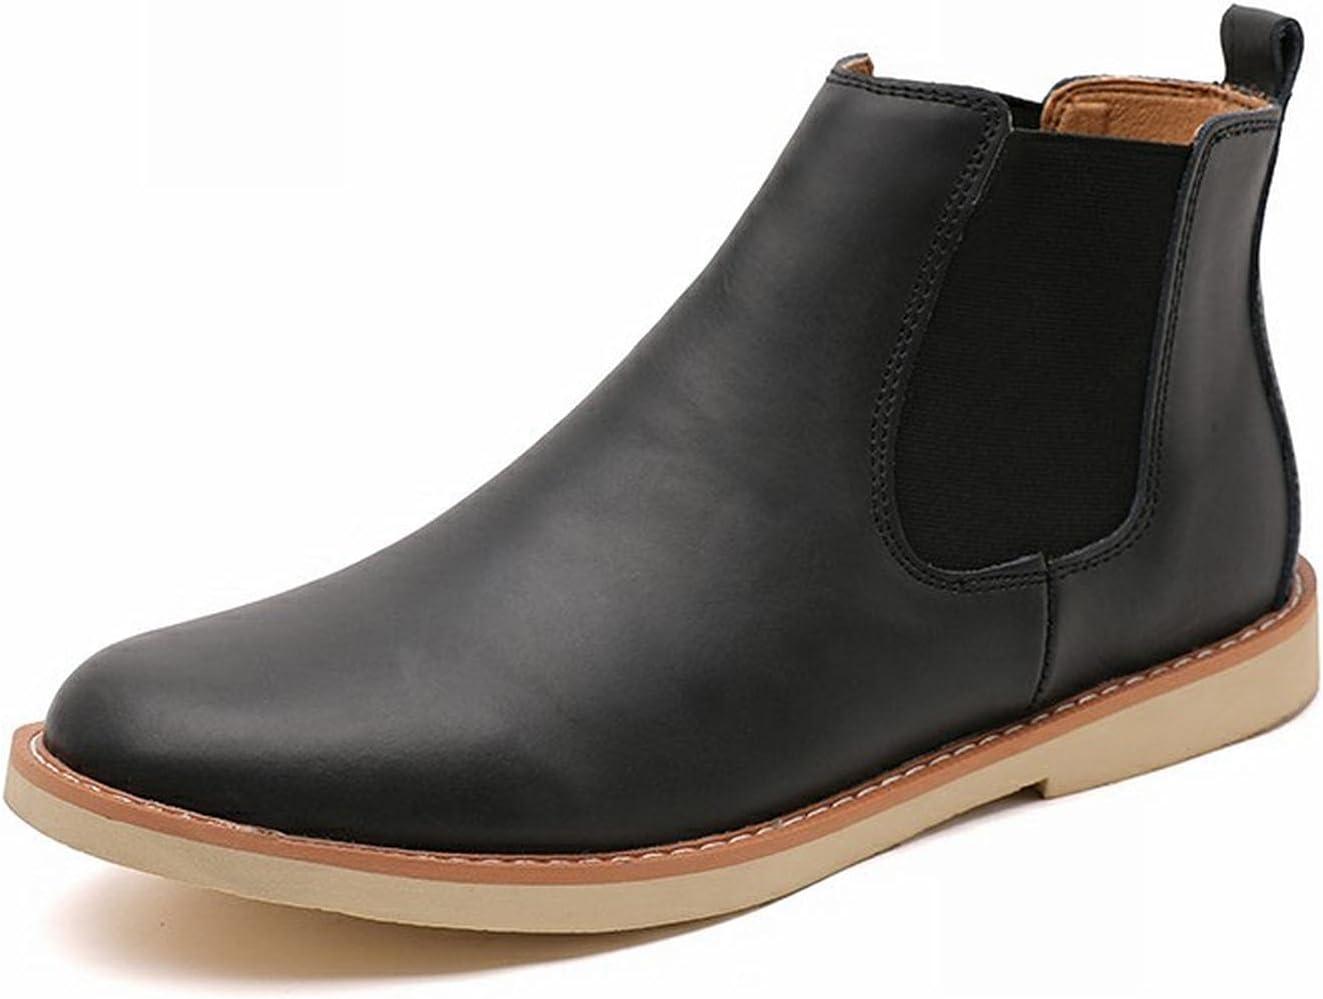 RHJK Chelsea Mens Boots Tan Leather Gusset Chelsea Mens Boots Textile Lining & TPR Soles Non-Slip Boots Work Slip On Shoes Black-39 EU